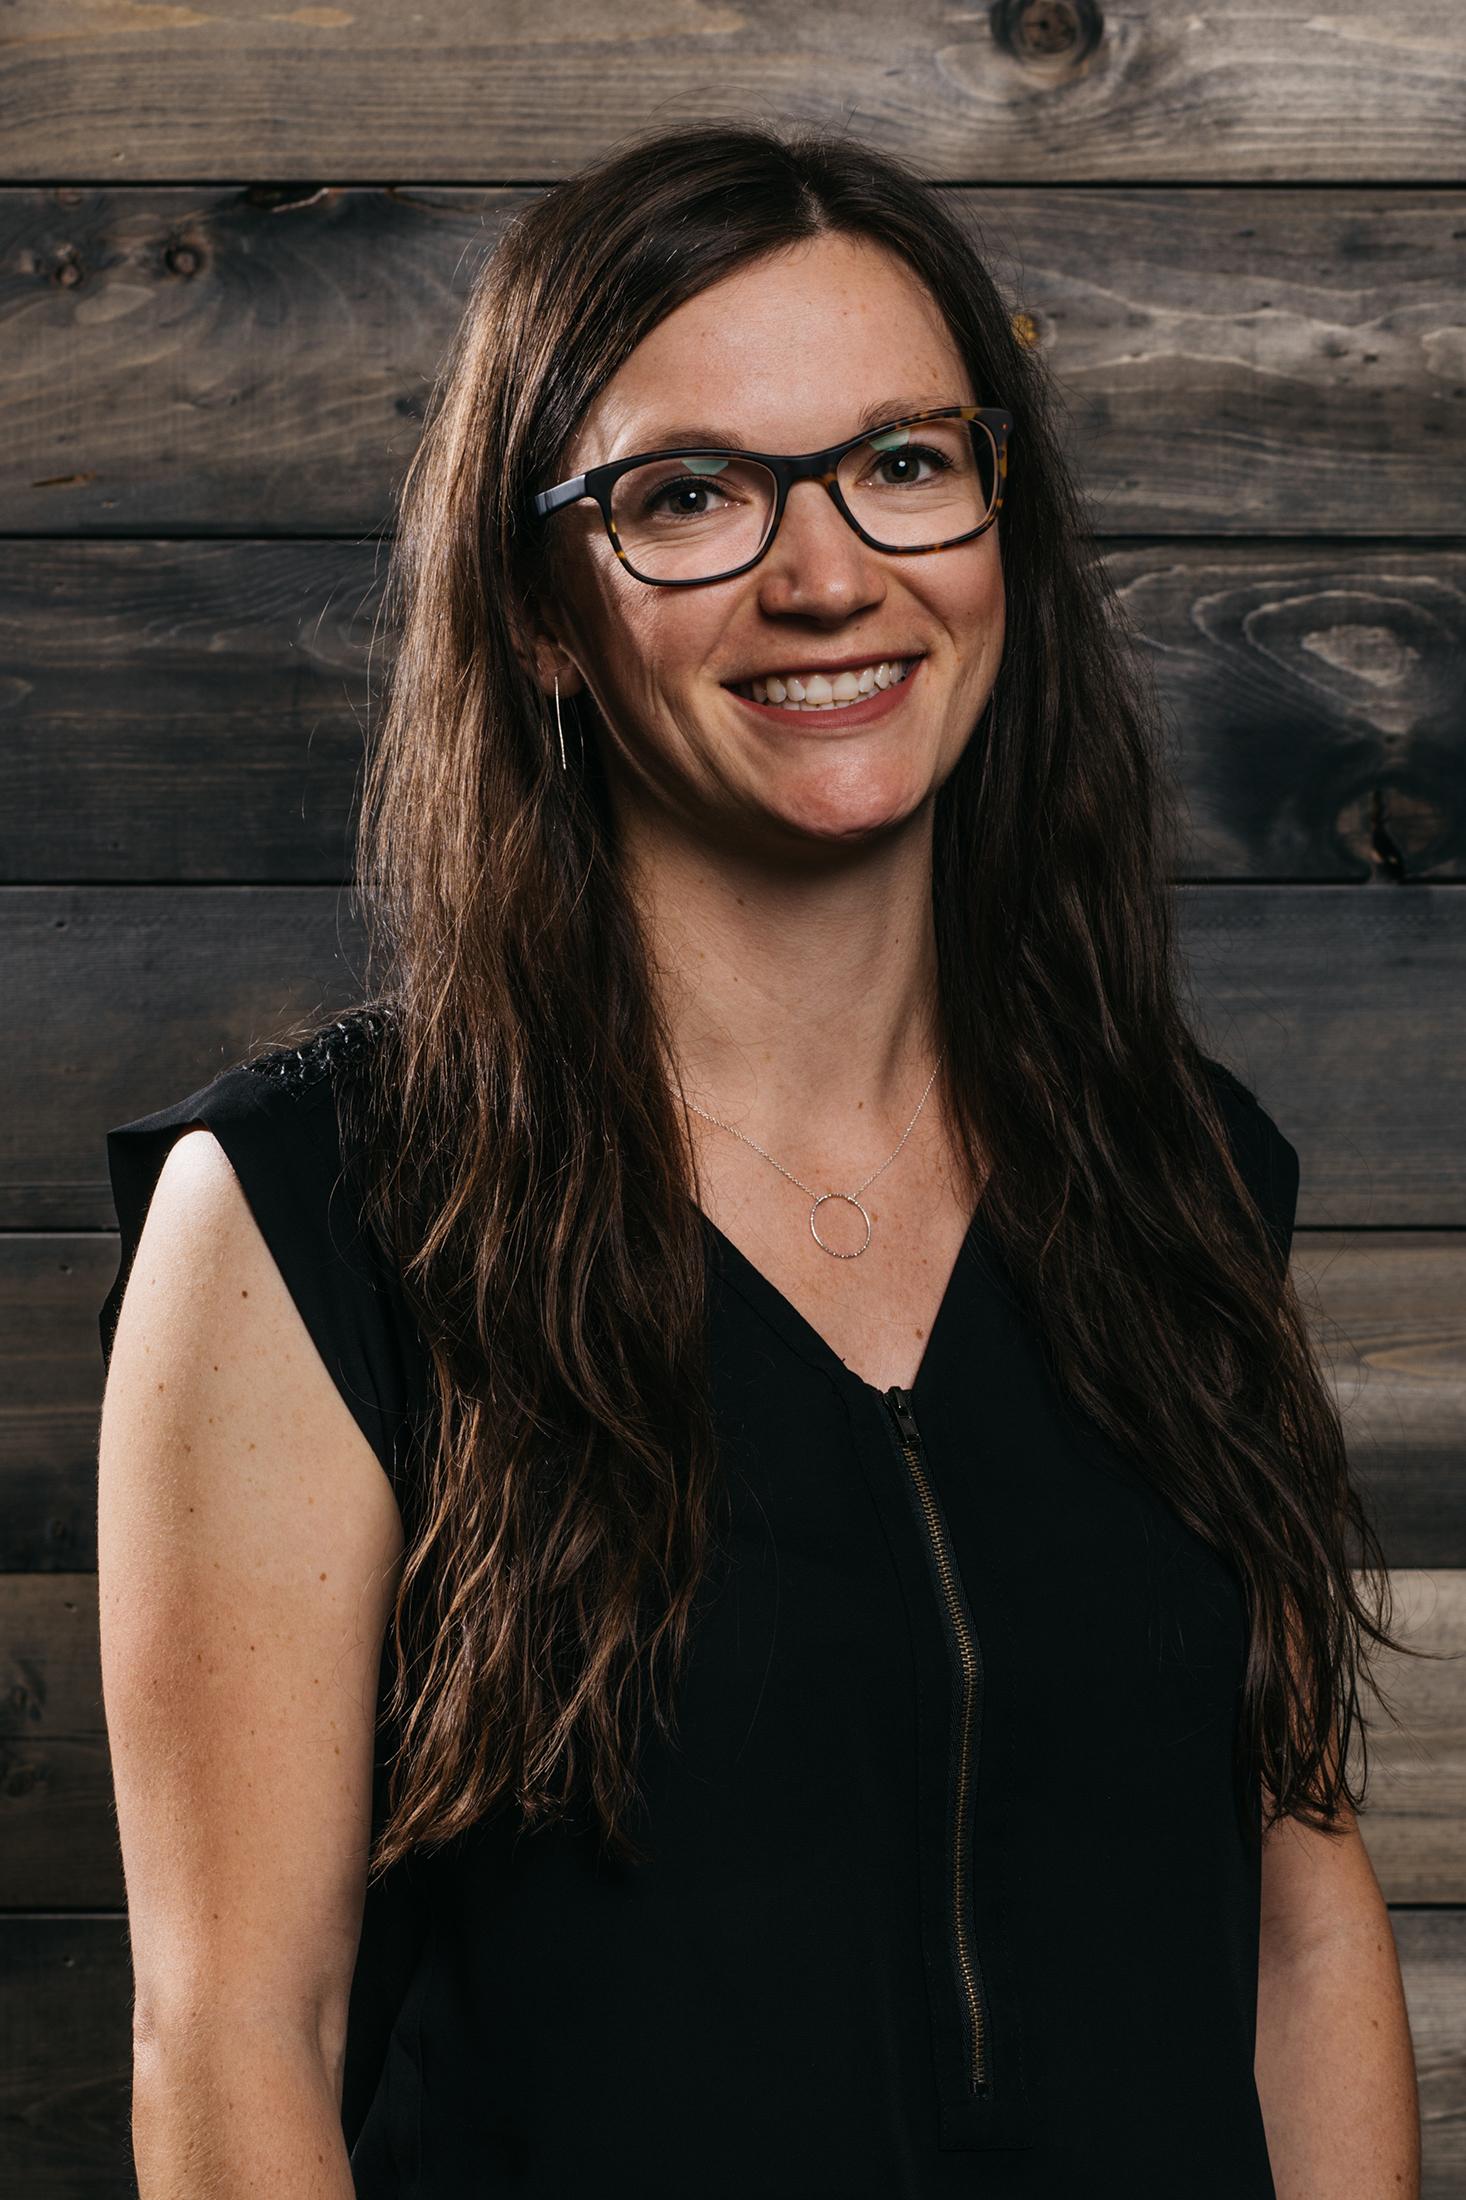 Katie Cheetham